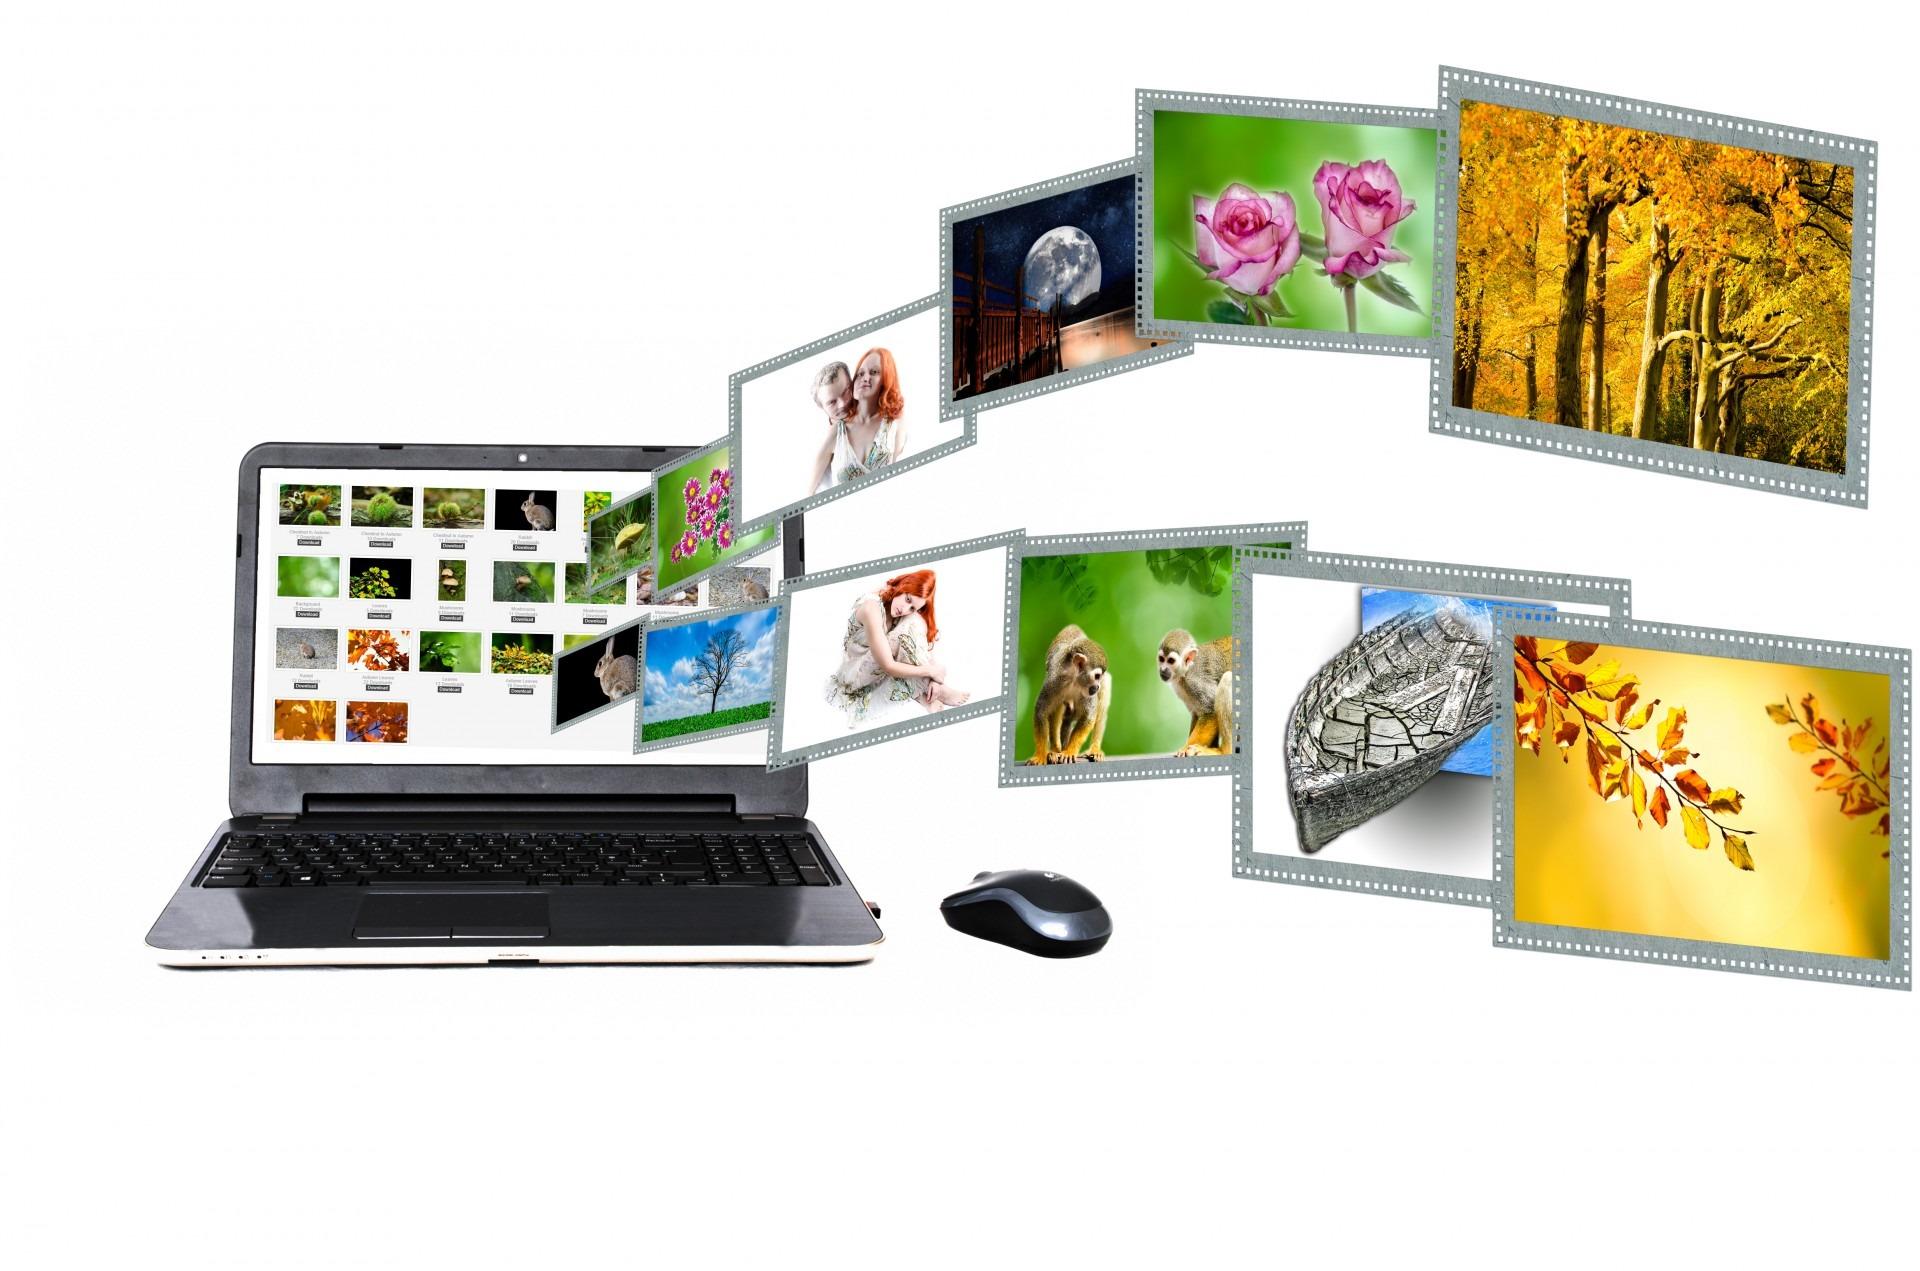 Tendance-2106-horticulture-potager-2.0-Facebook–medias-electronique